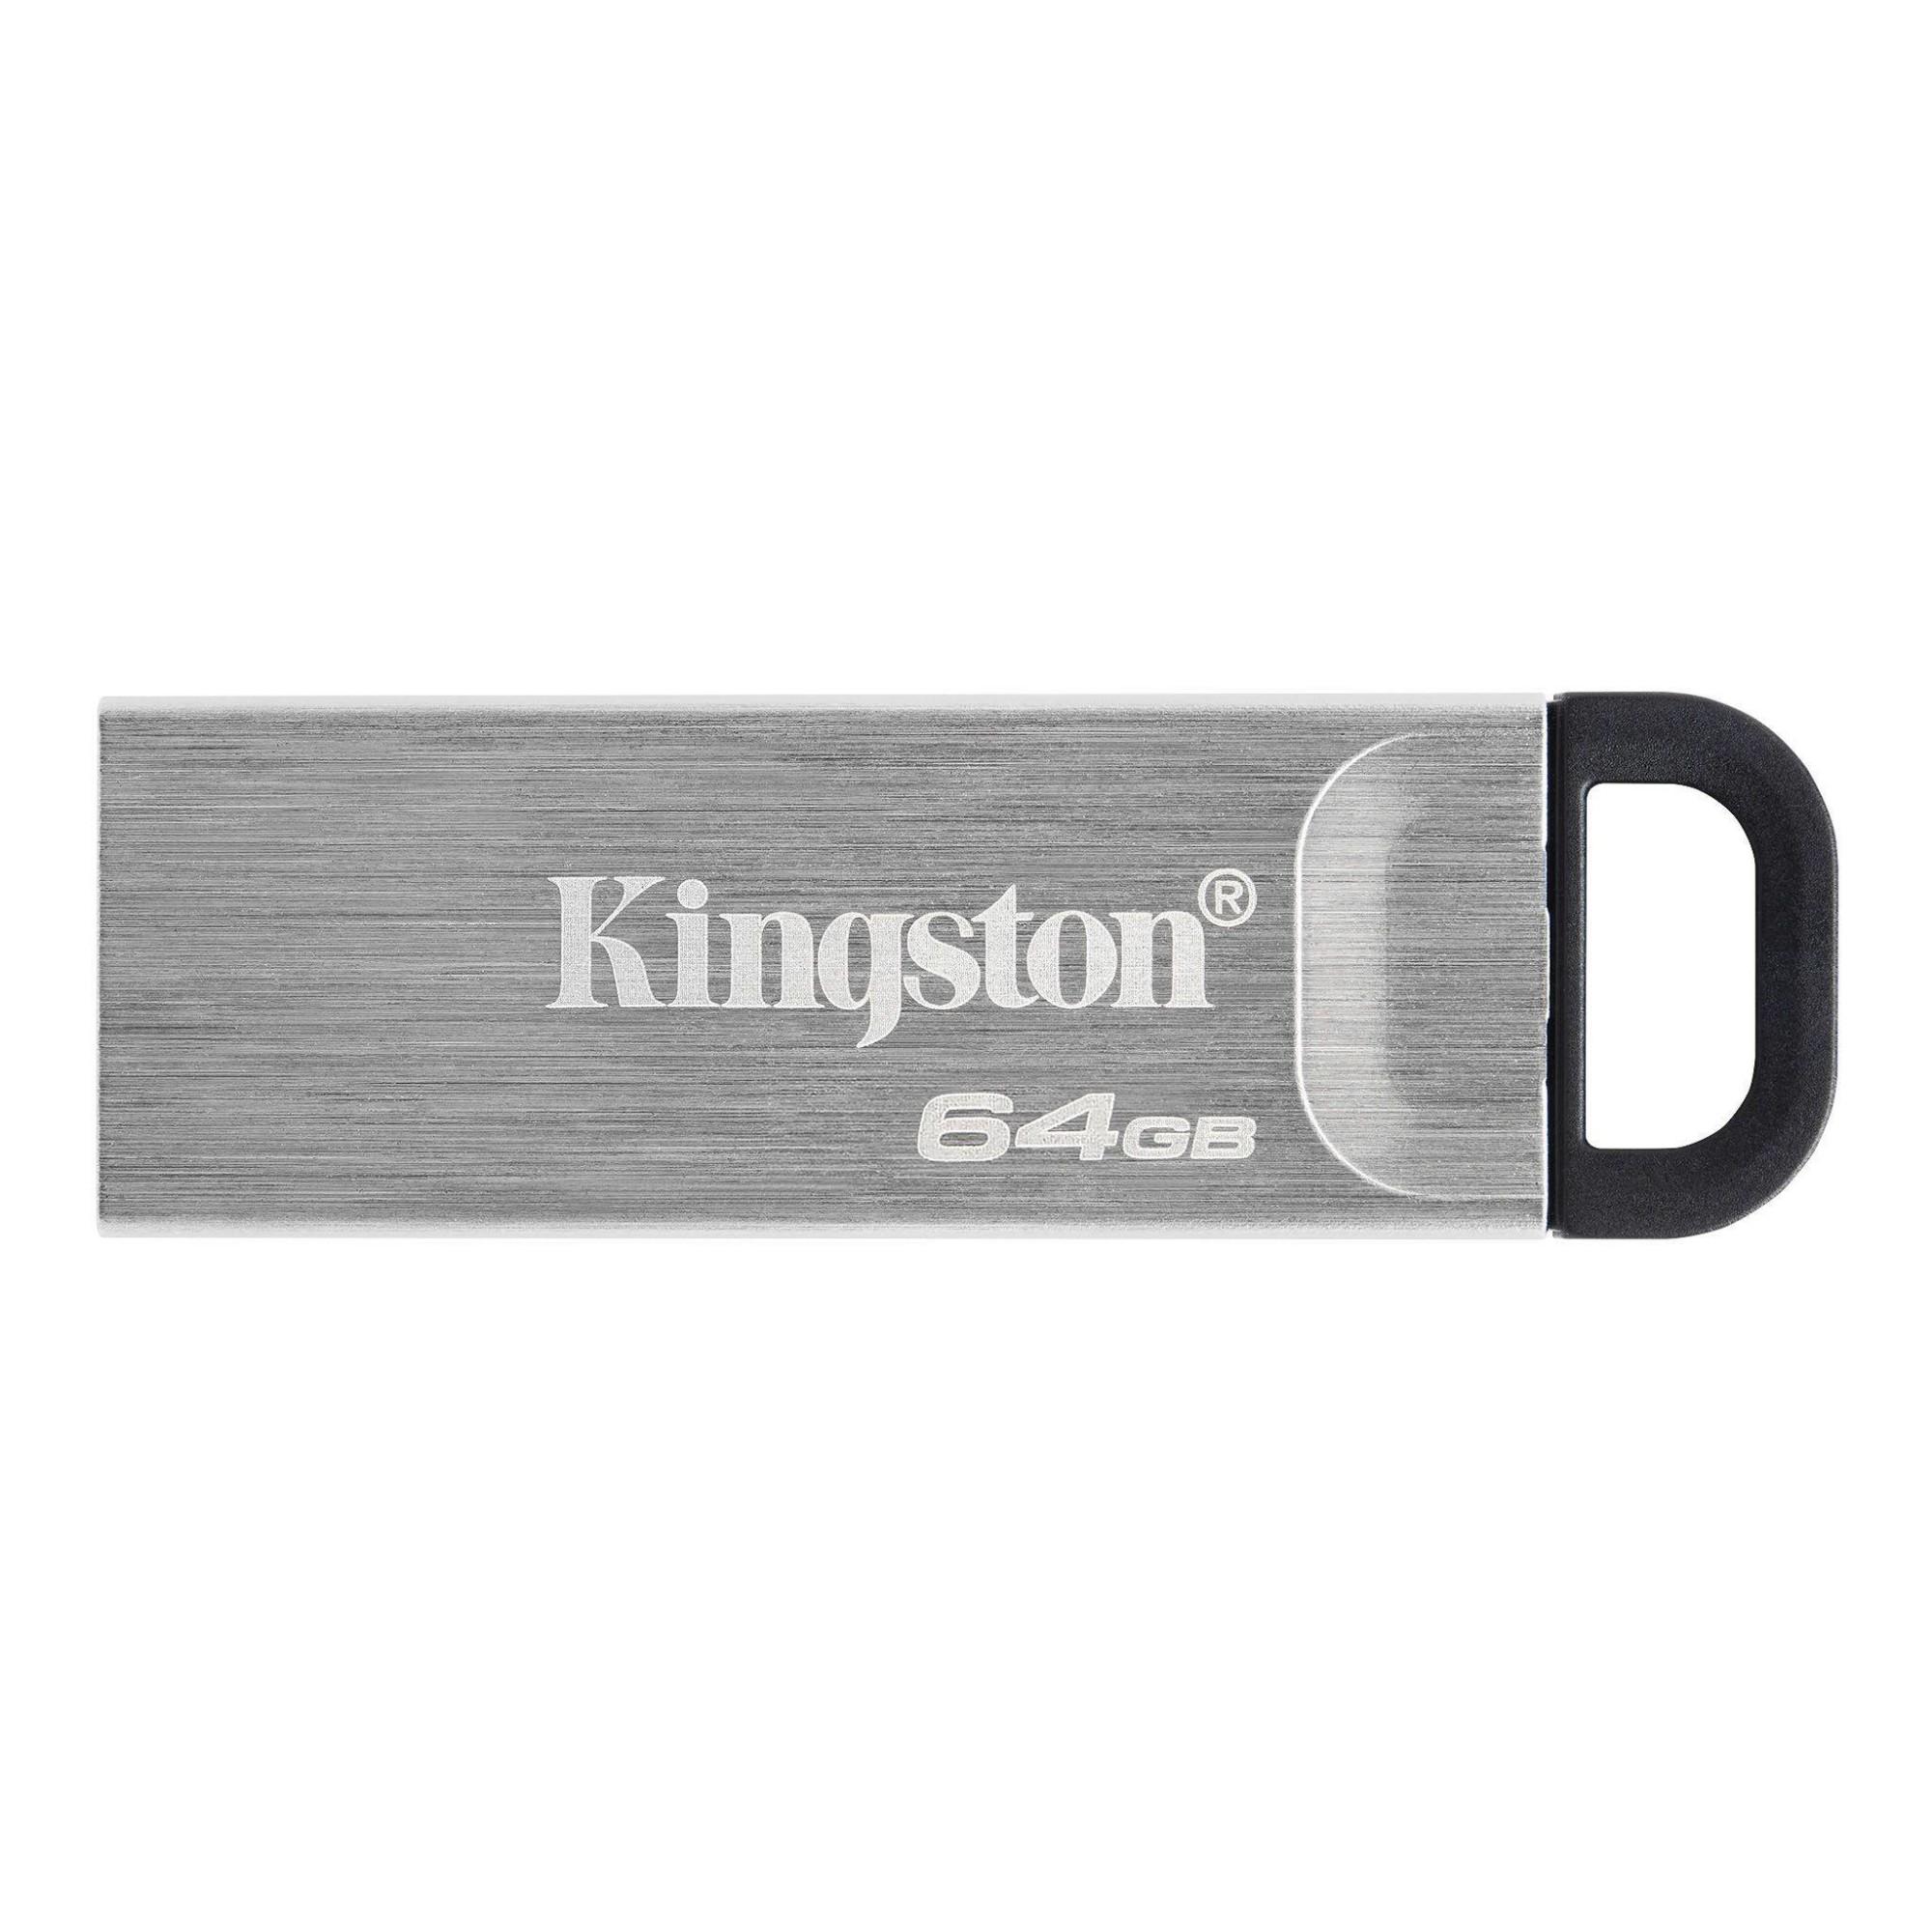 Kingston Technology DataTraveler Kyson USB flash drive 64 GB USB Type-A 3.2 Gen 1 (3.1 Gen 1) Silver